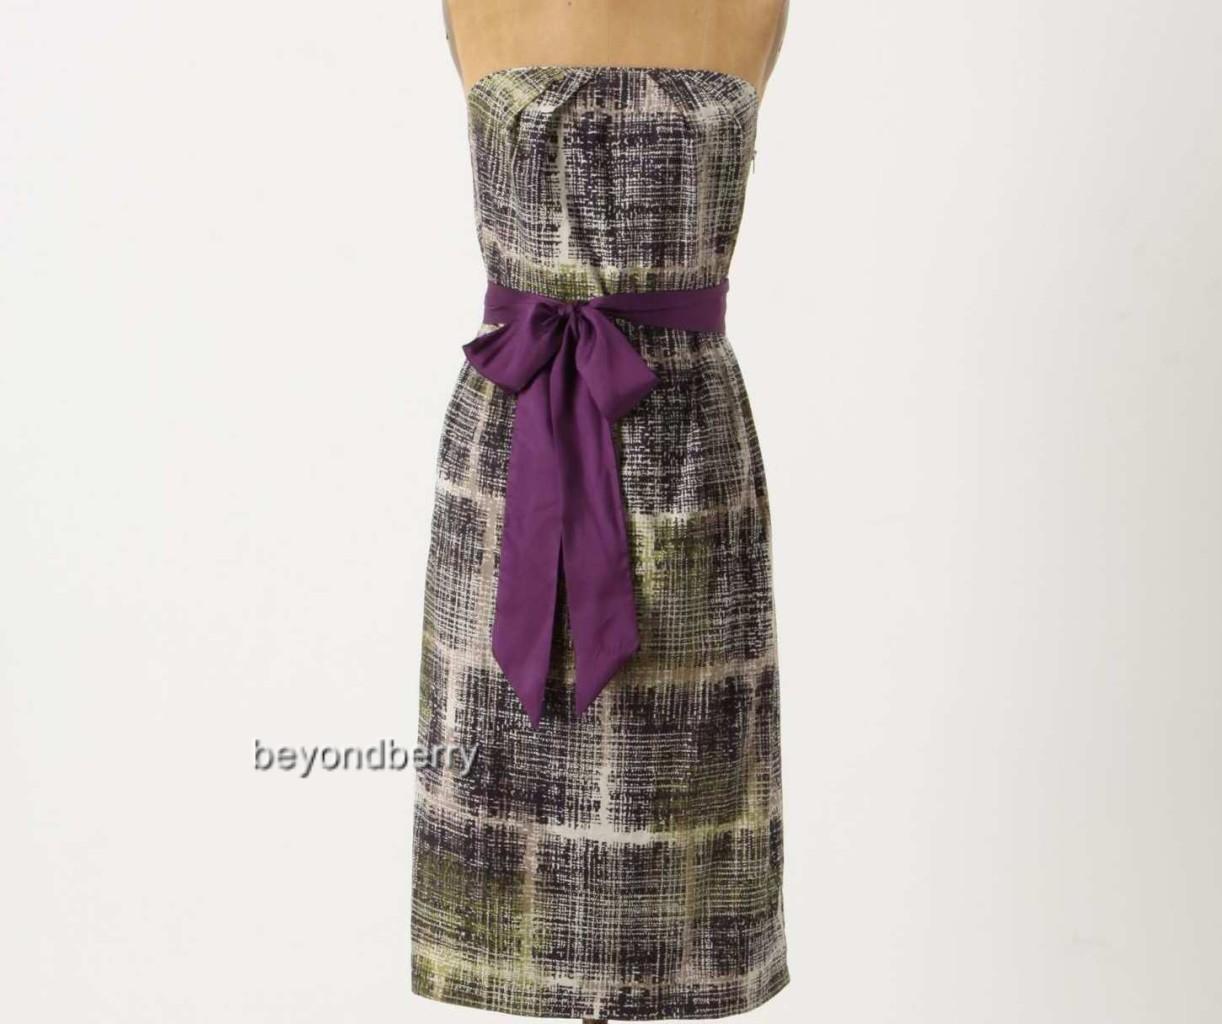 NEW Anthropologie Wythes Dress by Edme & Esyllte  Size 2